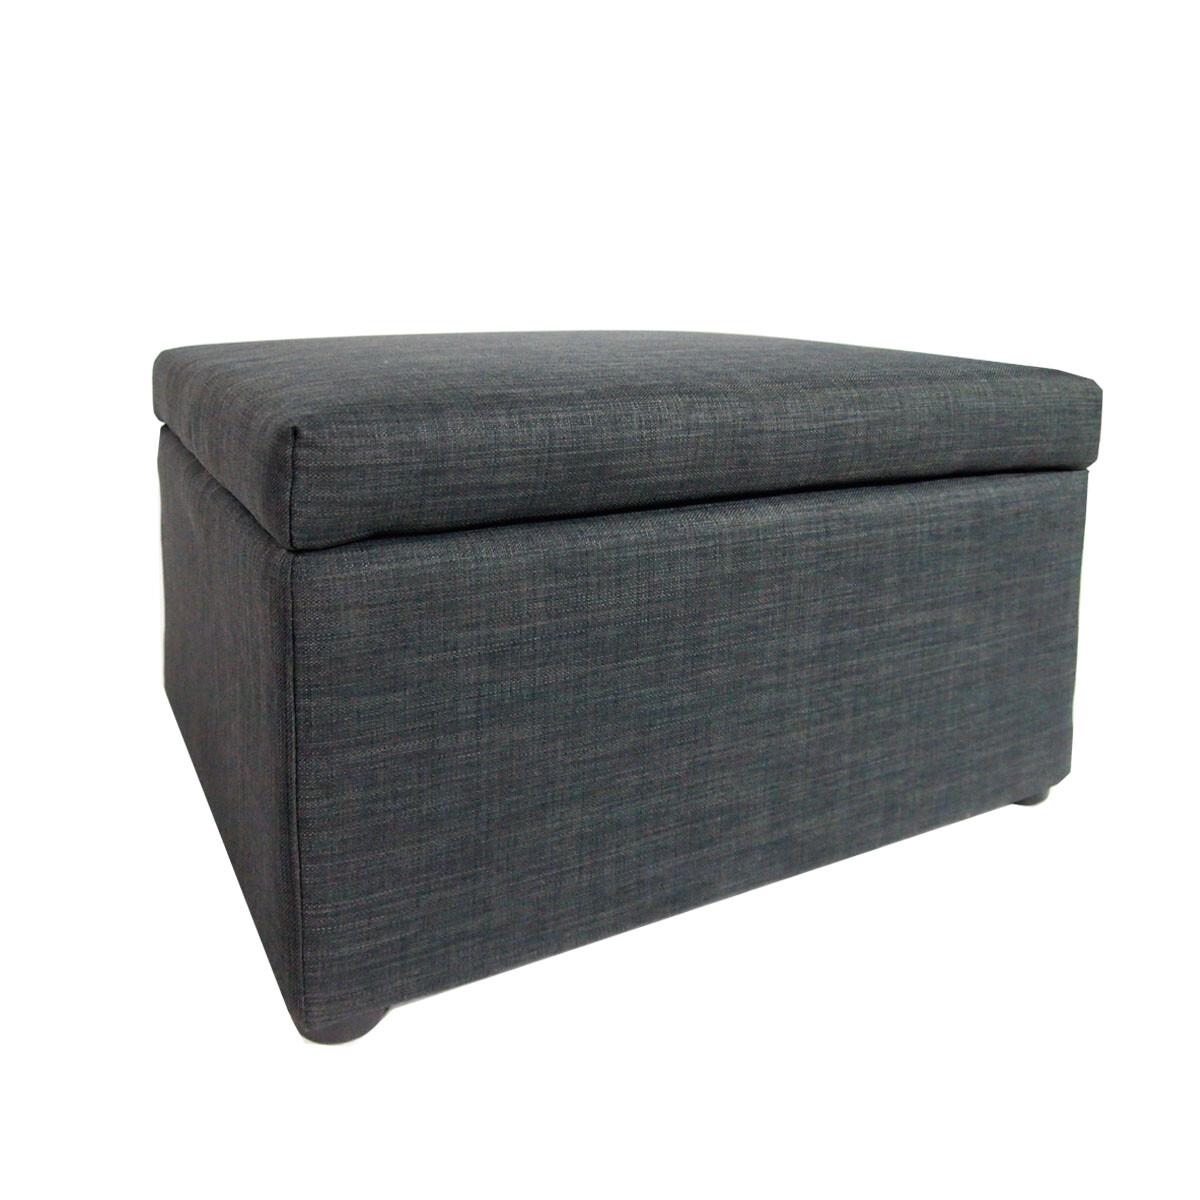 Furniture & Home Décor